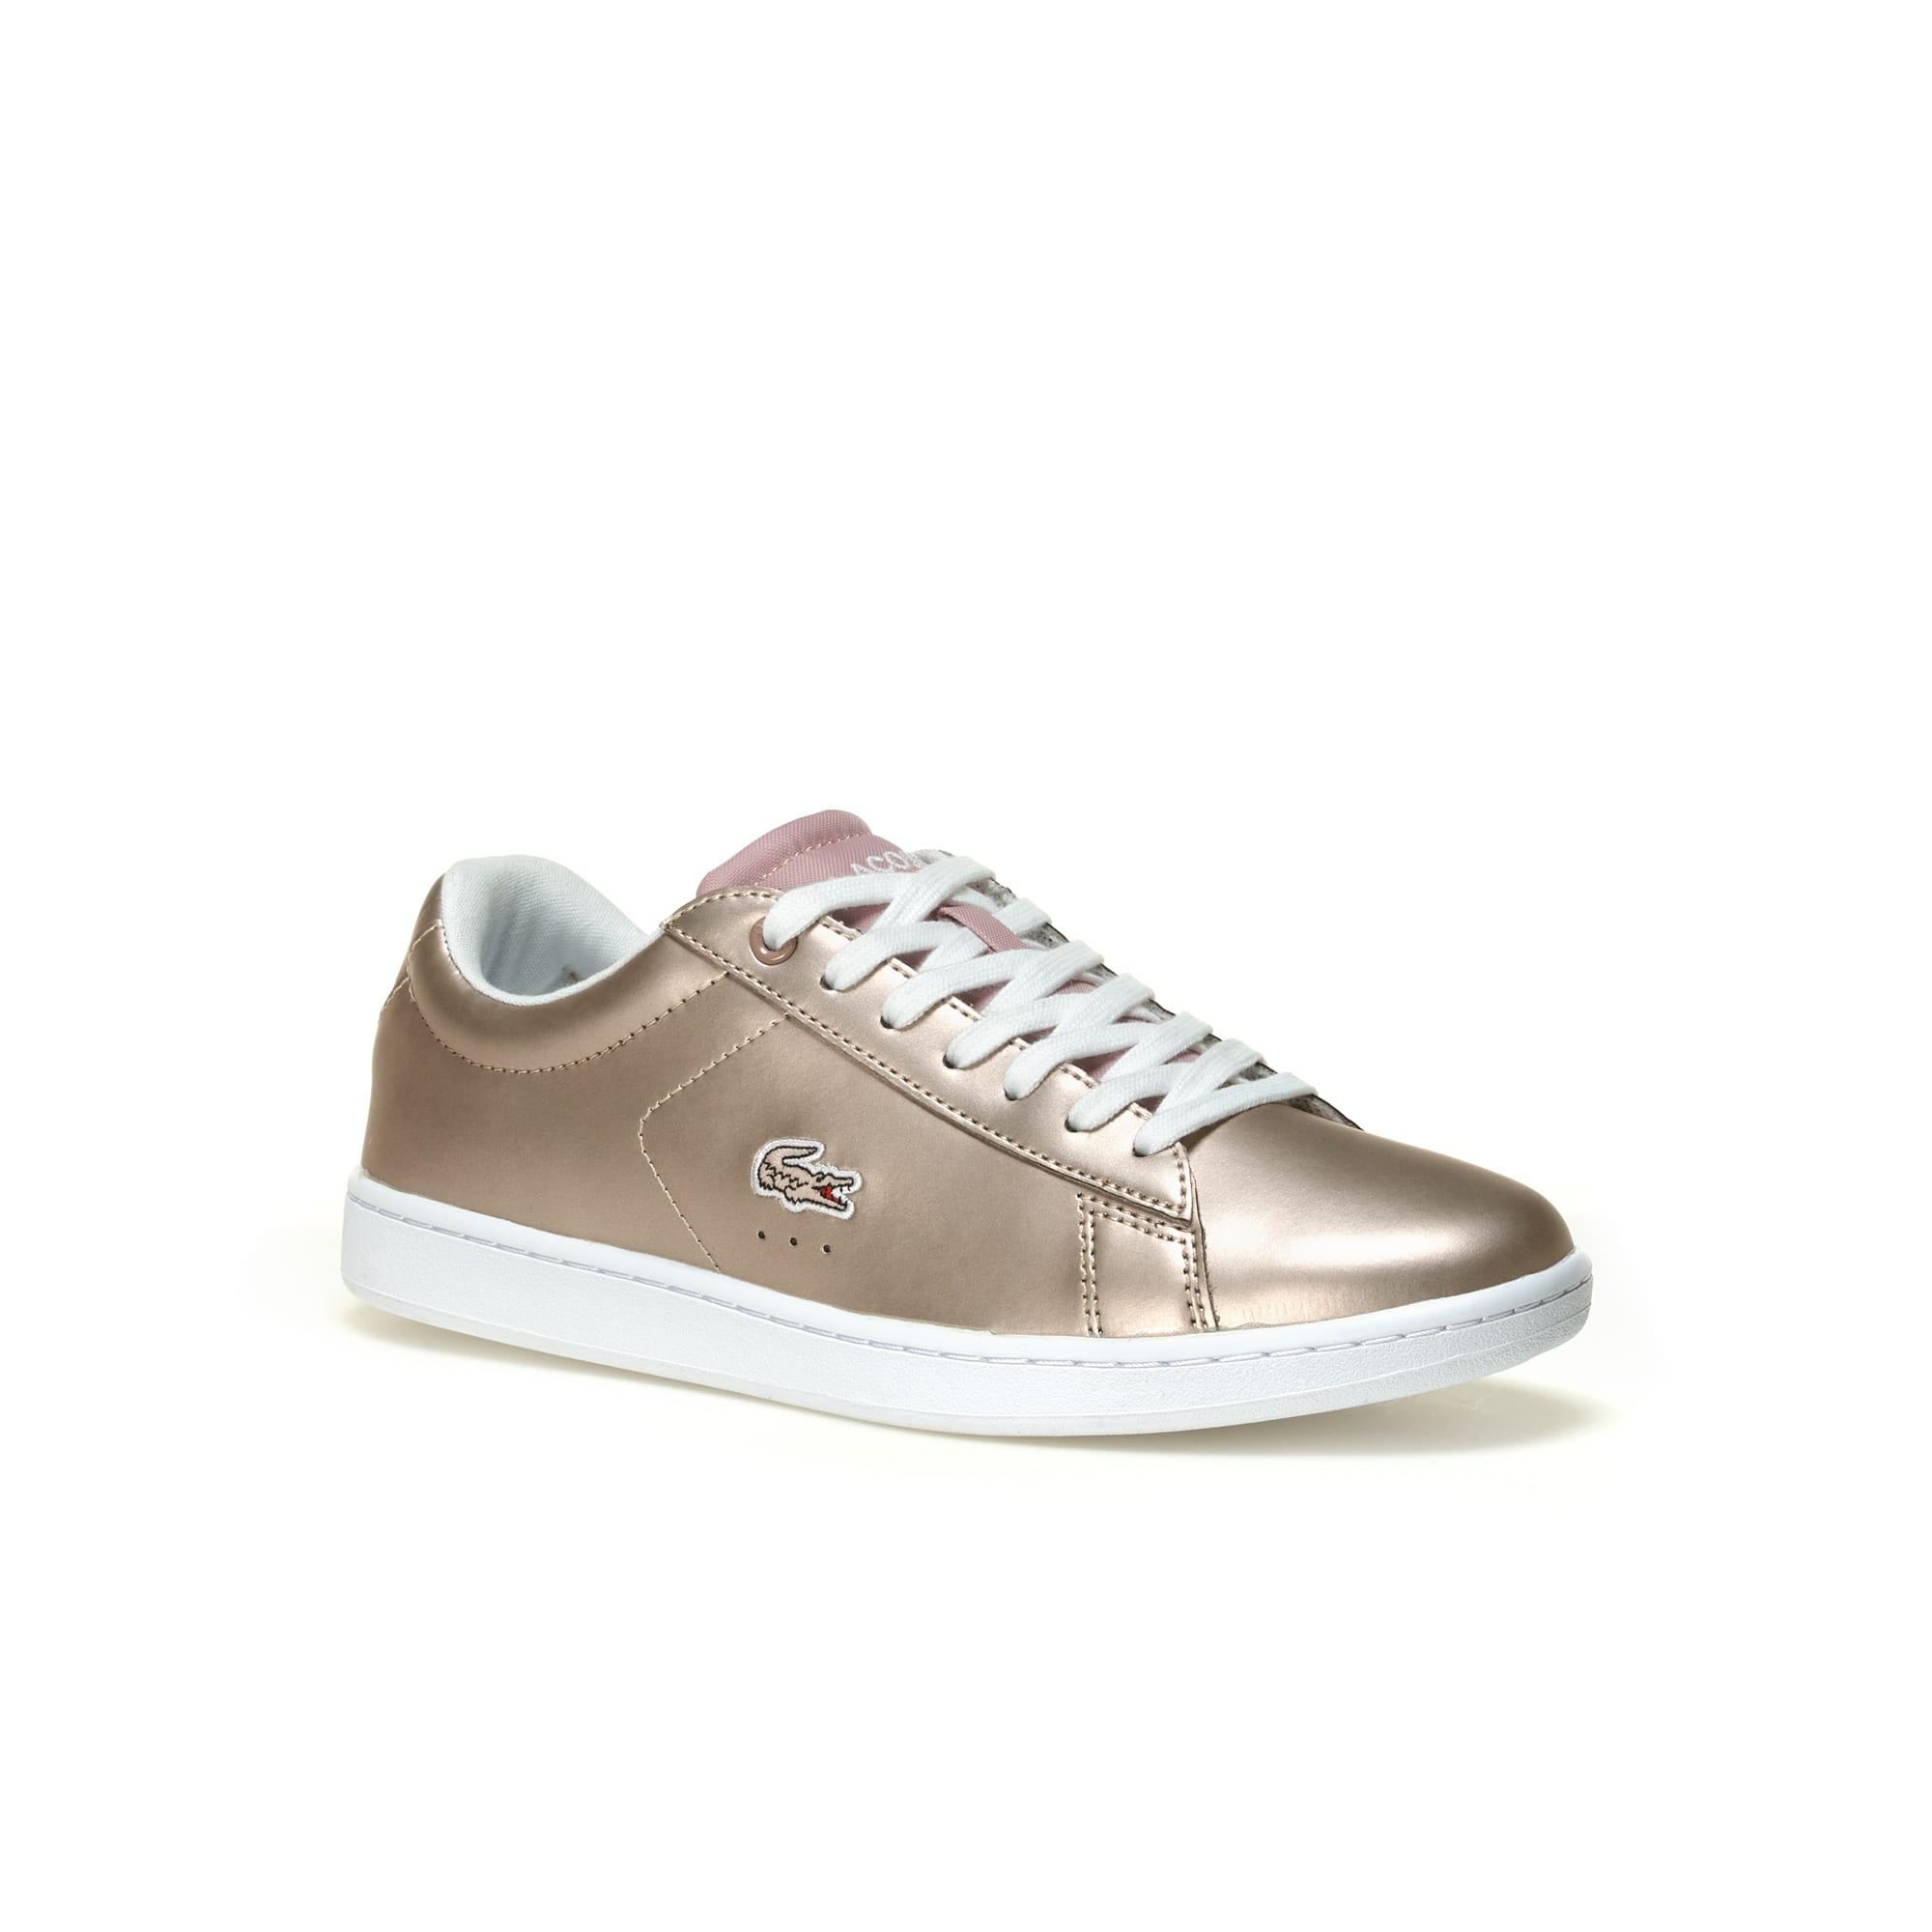 Sneakers Carnaby Evo métallisées